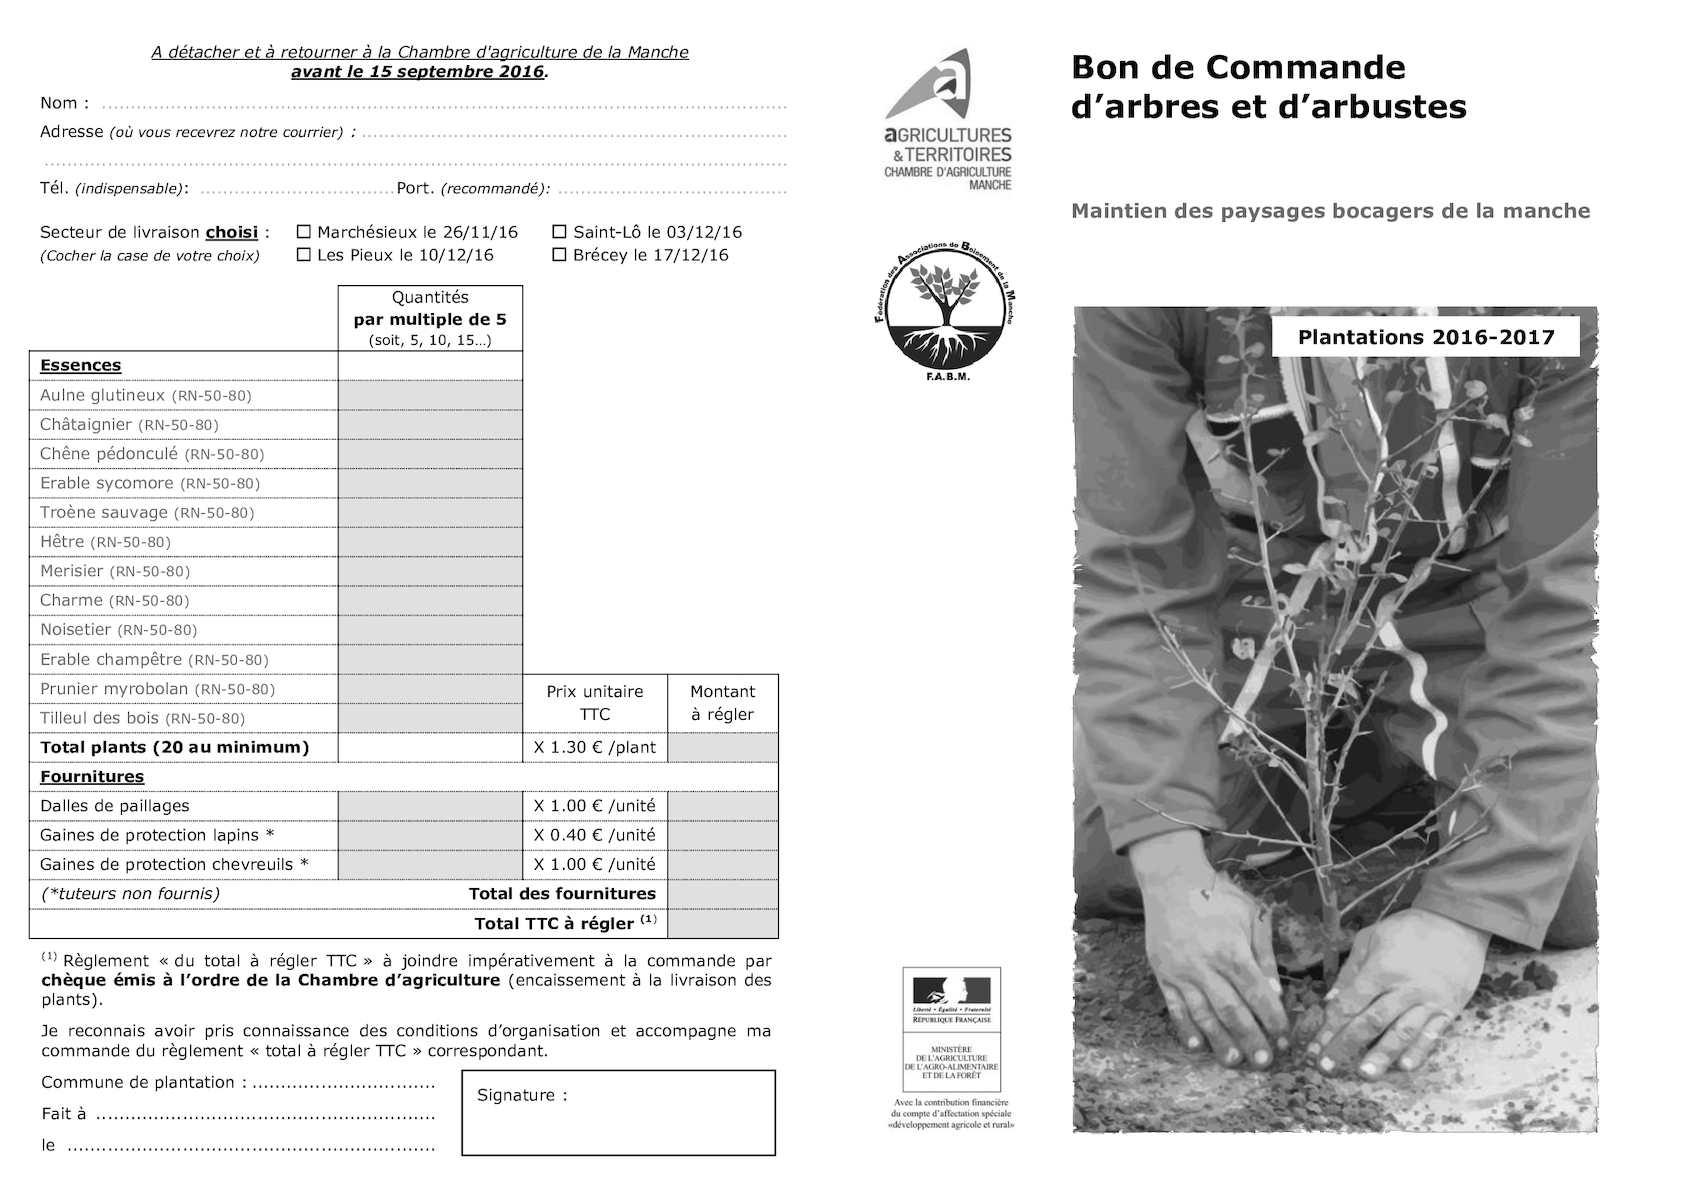 Calam o bon commande arbres et arbustes 2016 for Chambre agriculture manche